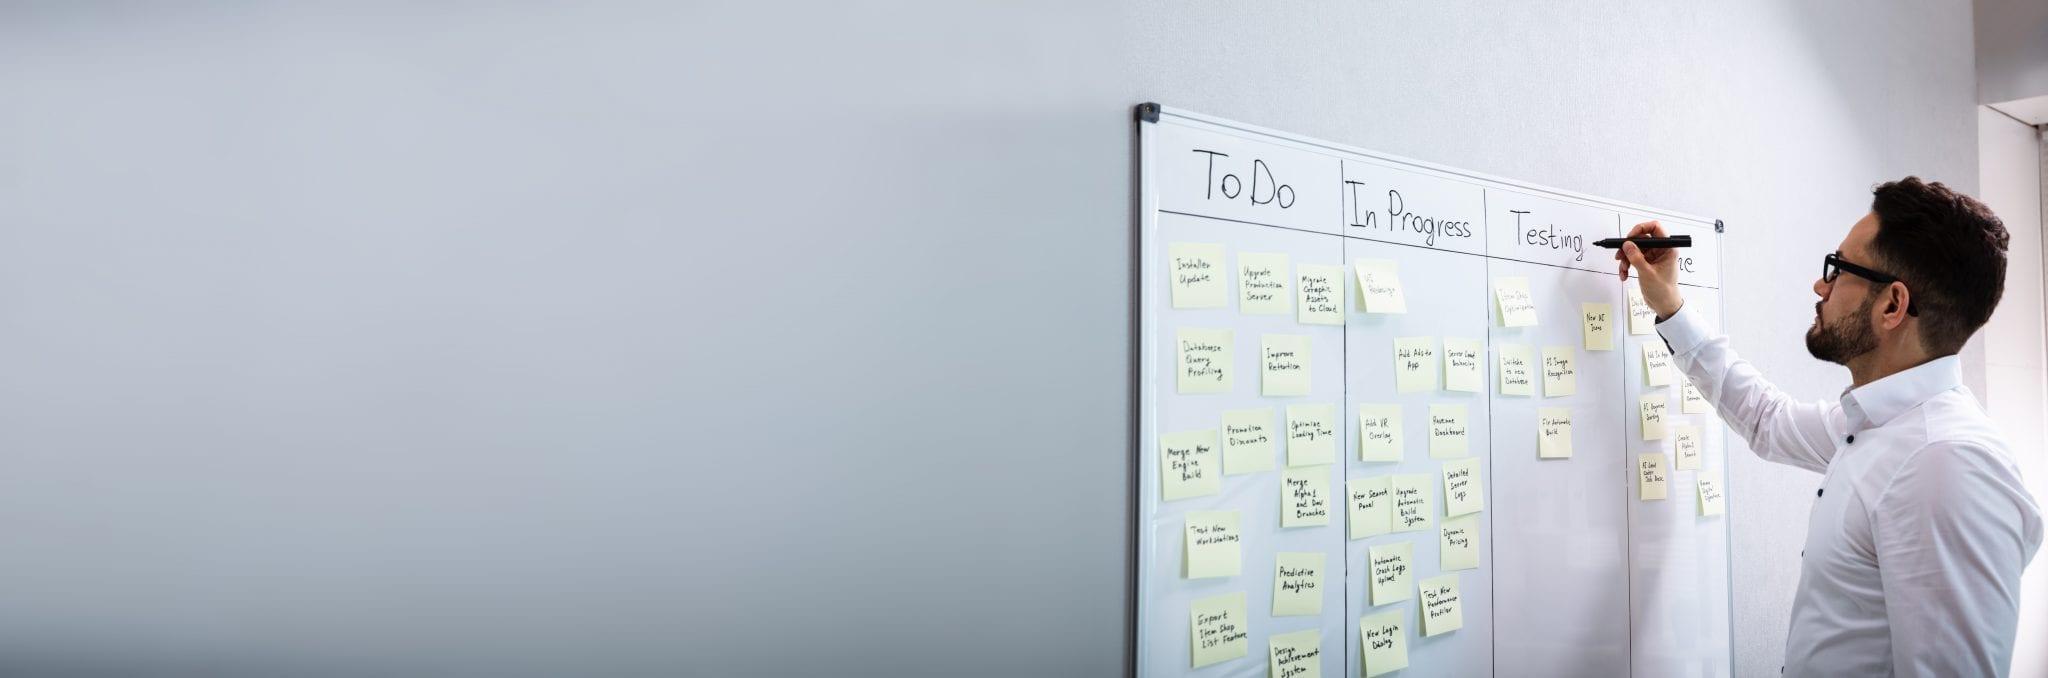 Waterfall or Agile Checklist